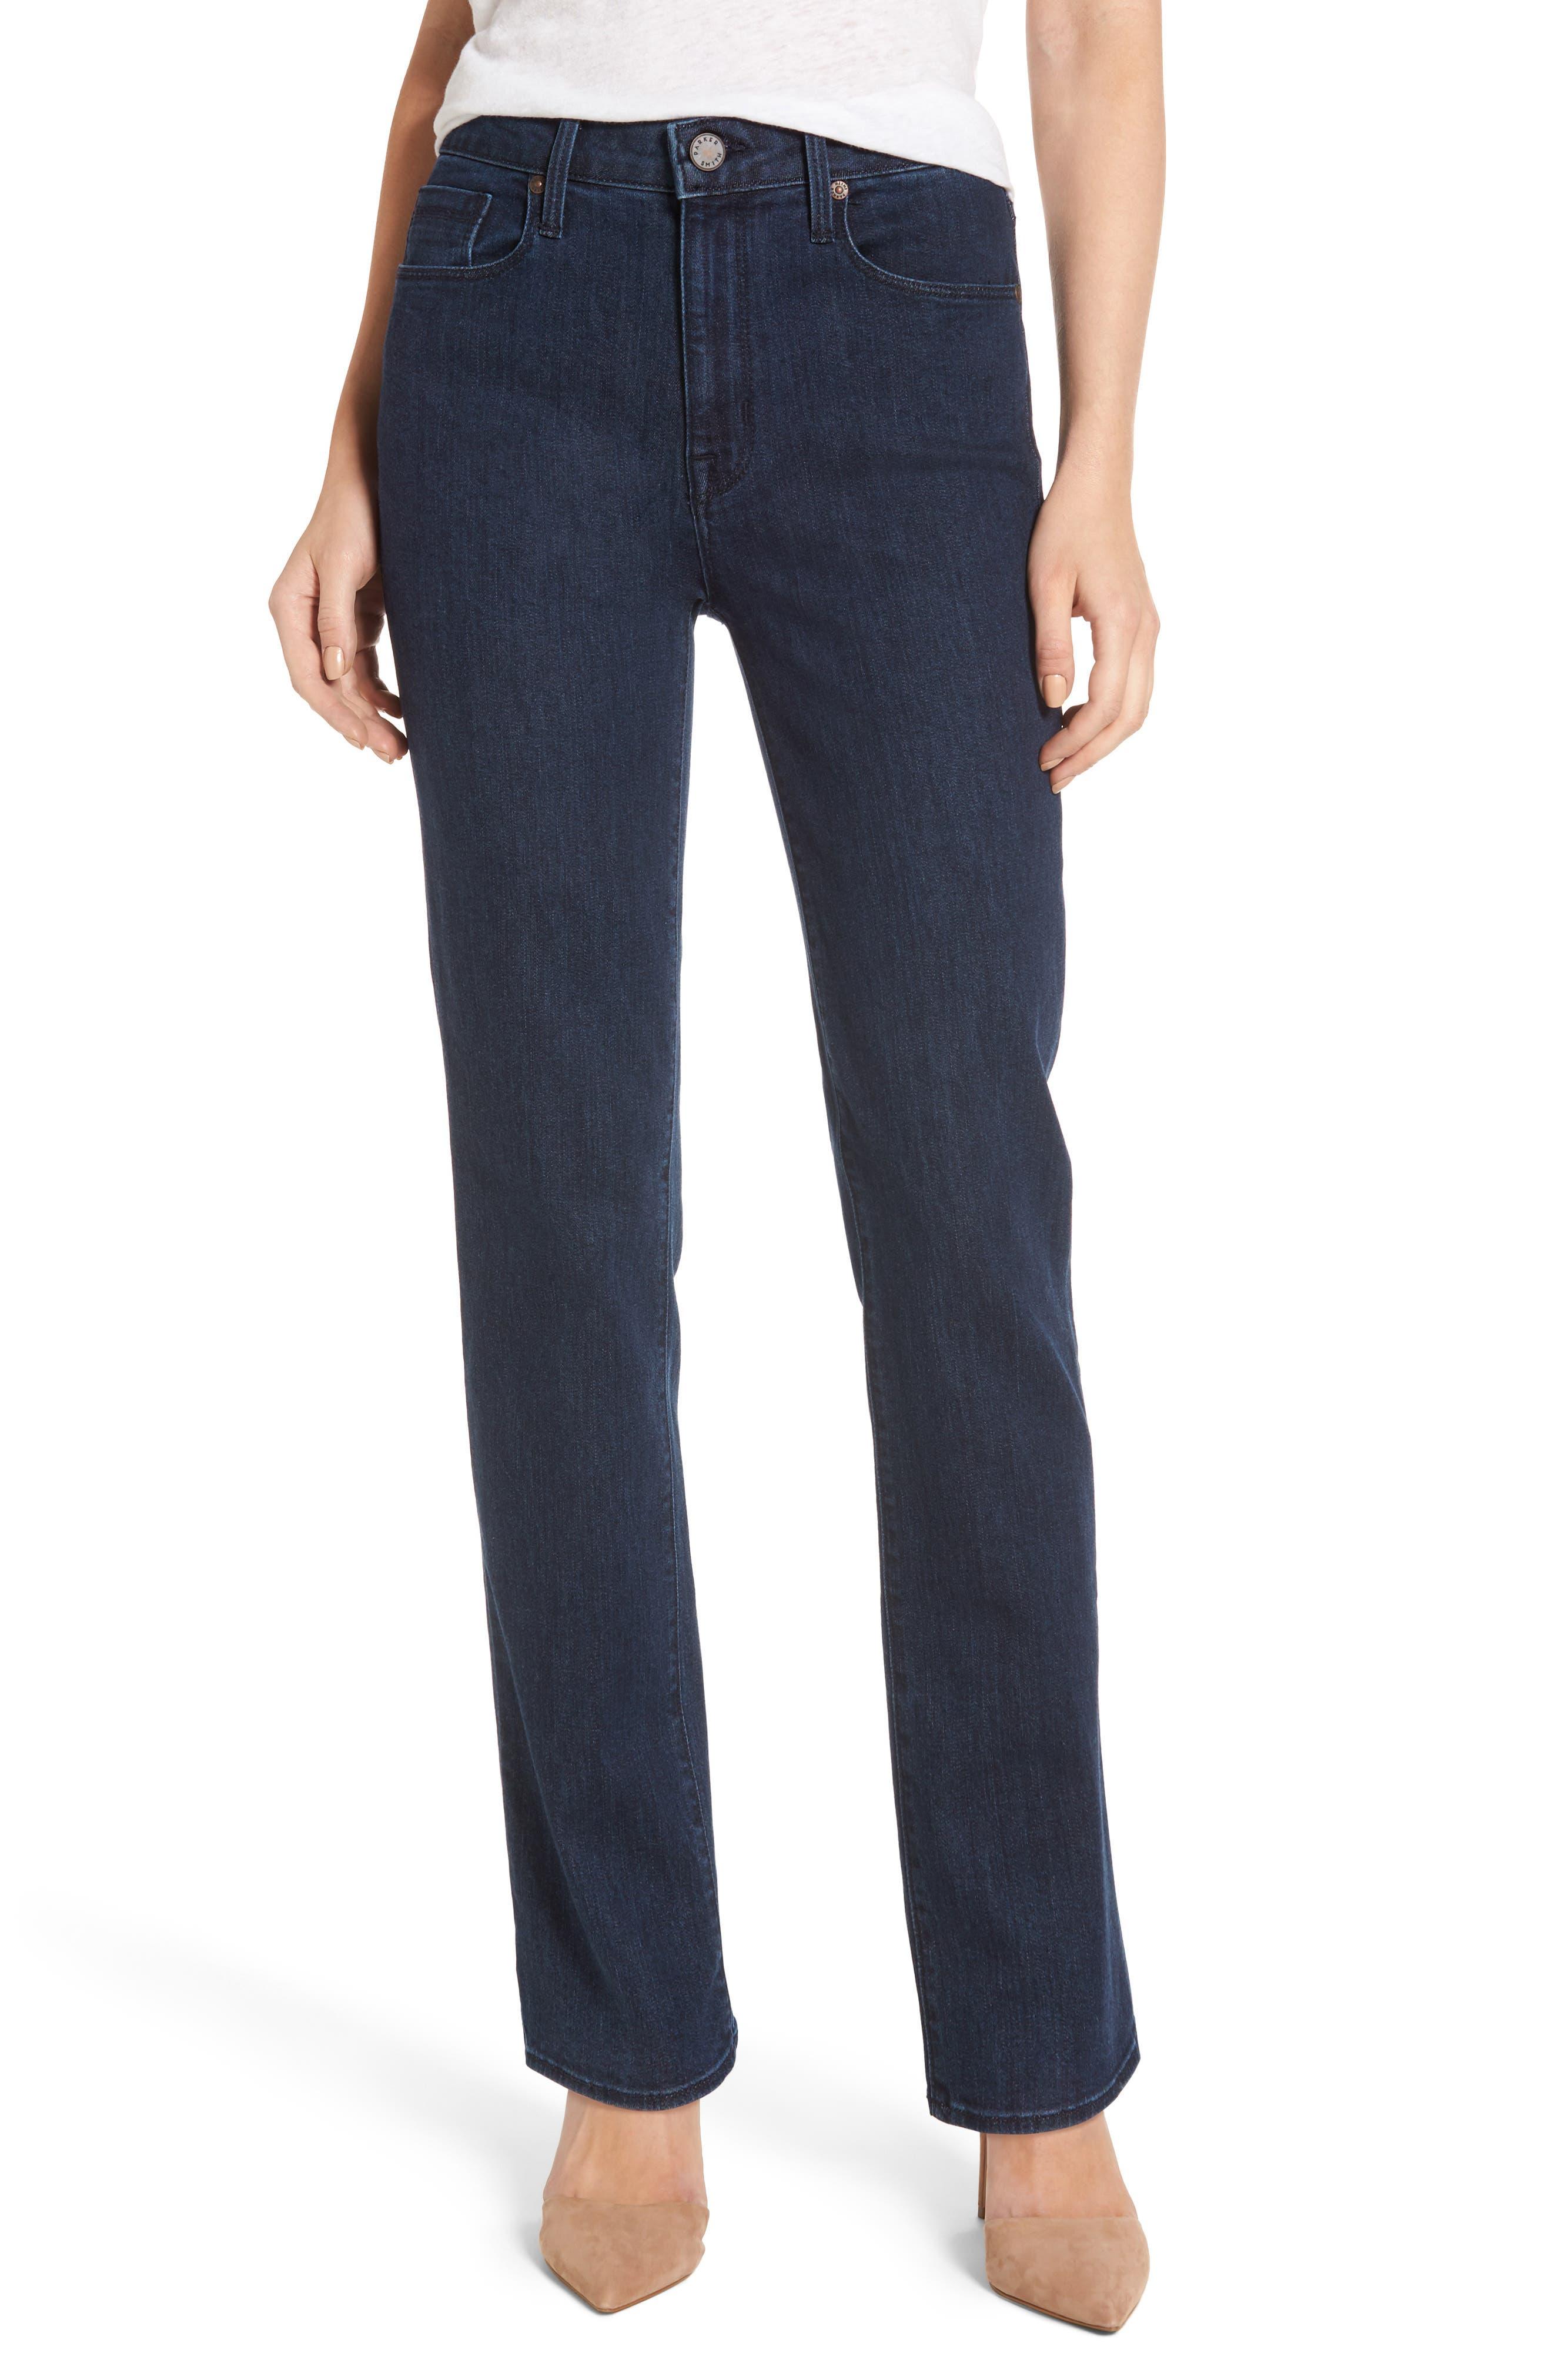 PARKER SMITH Bombshell Runaround Straight Leg Jeans